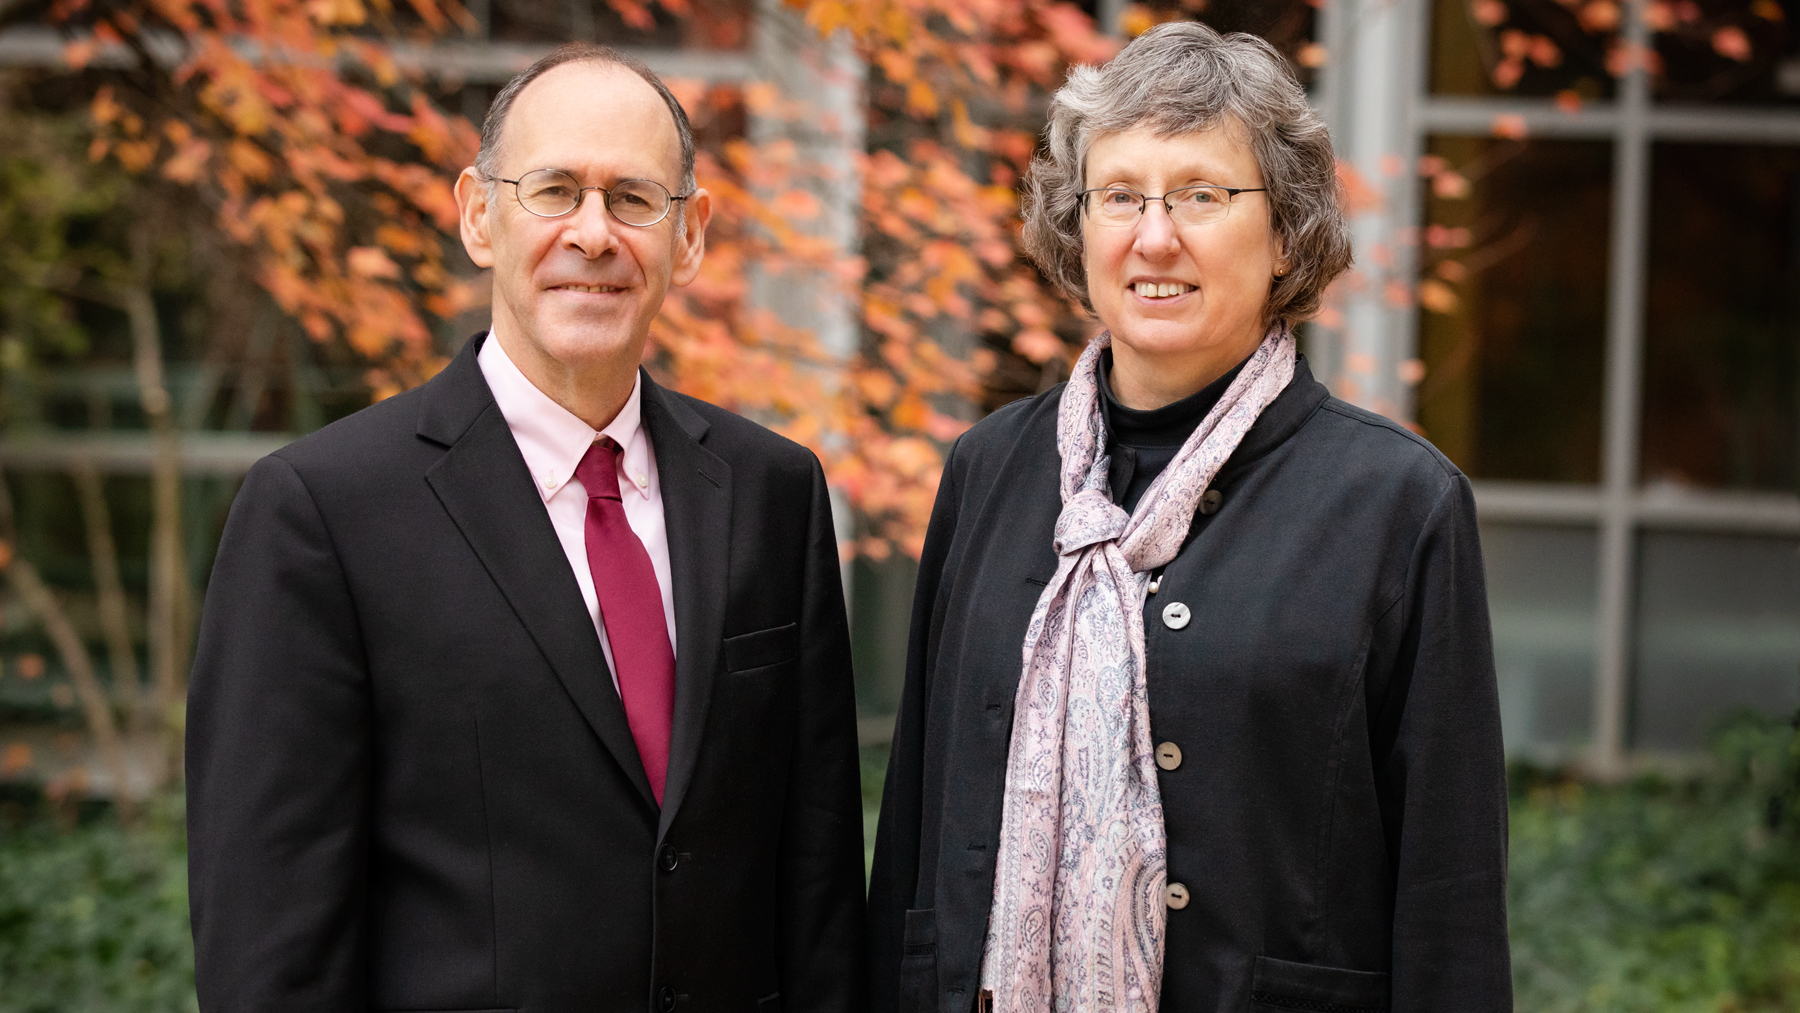 computer science professor Sheldon H. Jacobson and internal medicine professor Janet Jokela. Photo by Brian Stauffer